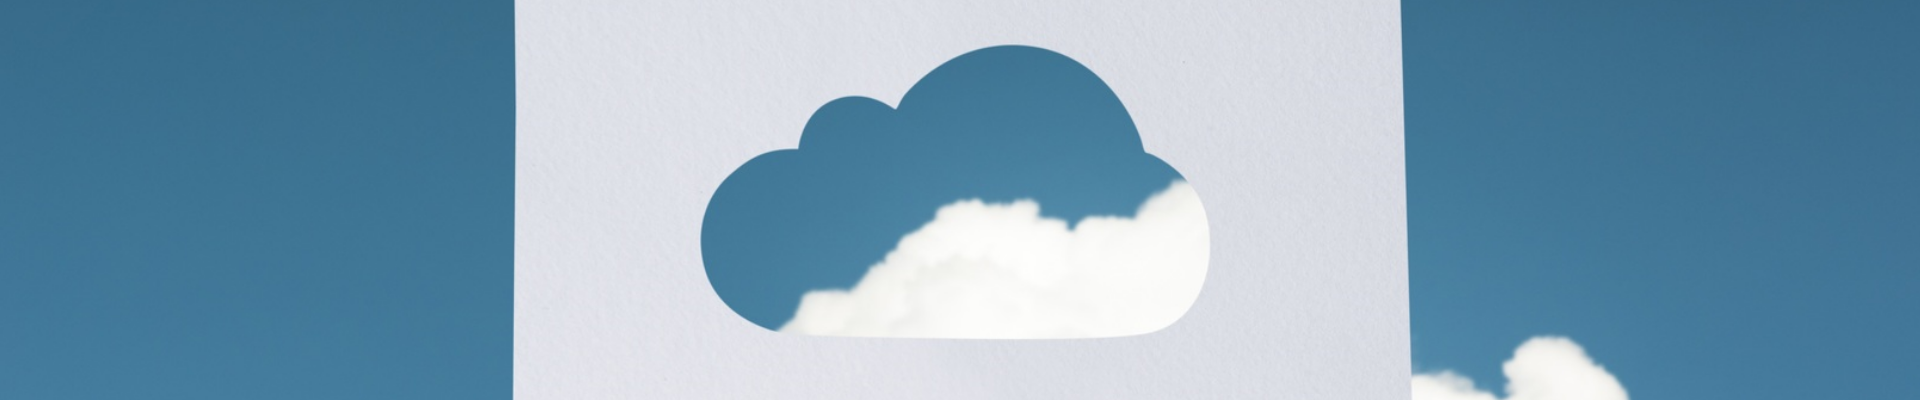 Soluzioni-cloud-ithesia-sistemi-srl